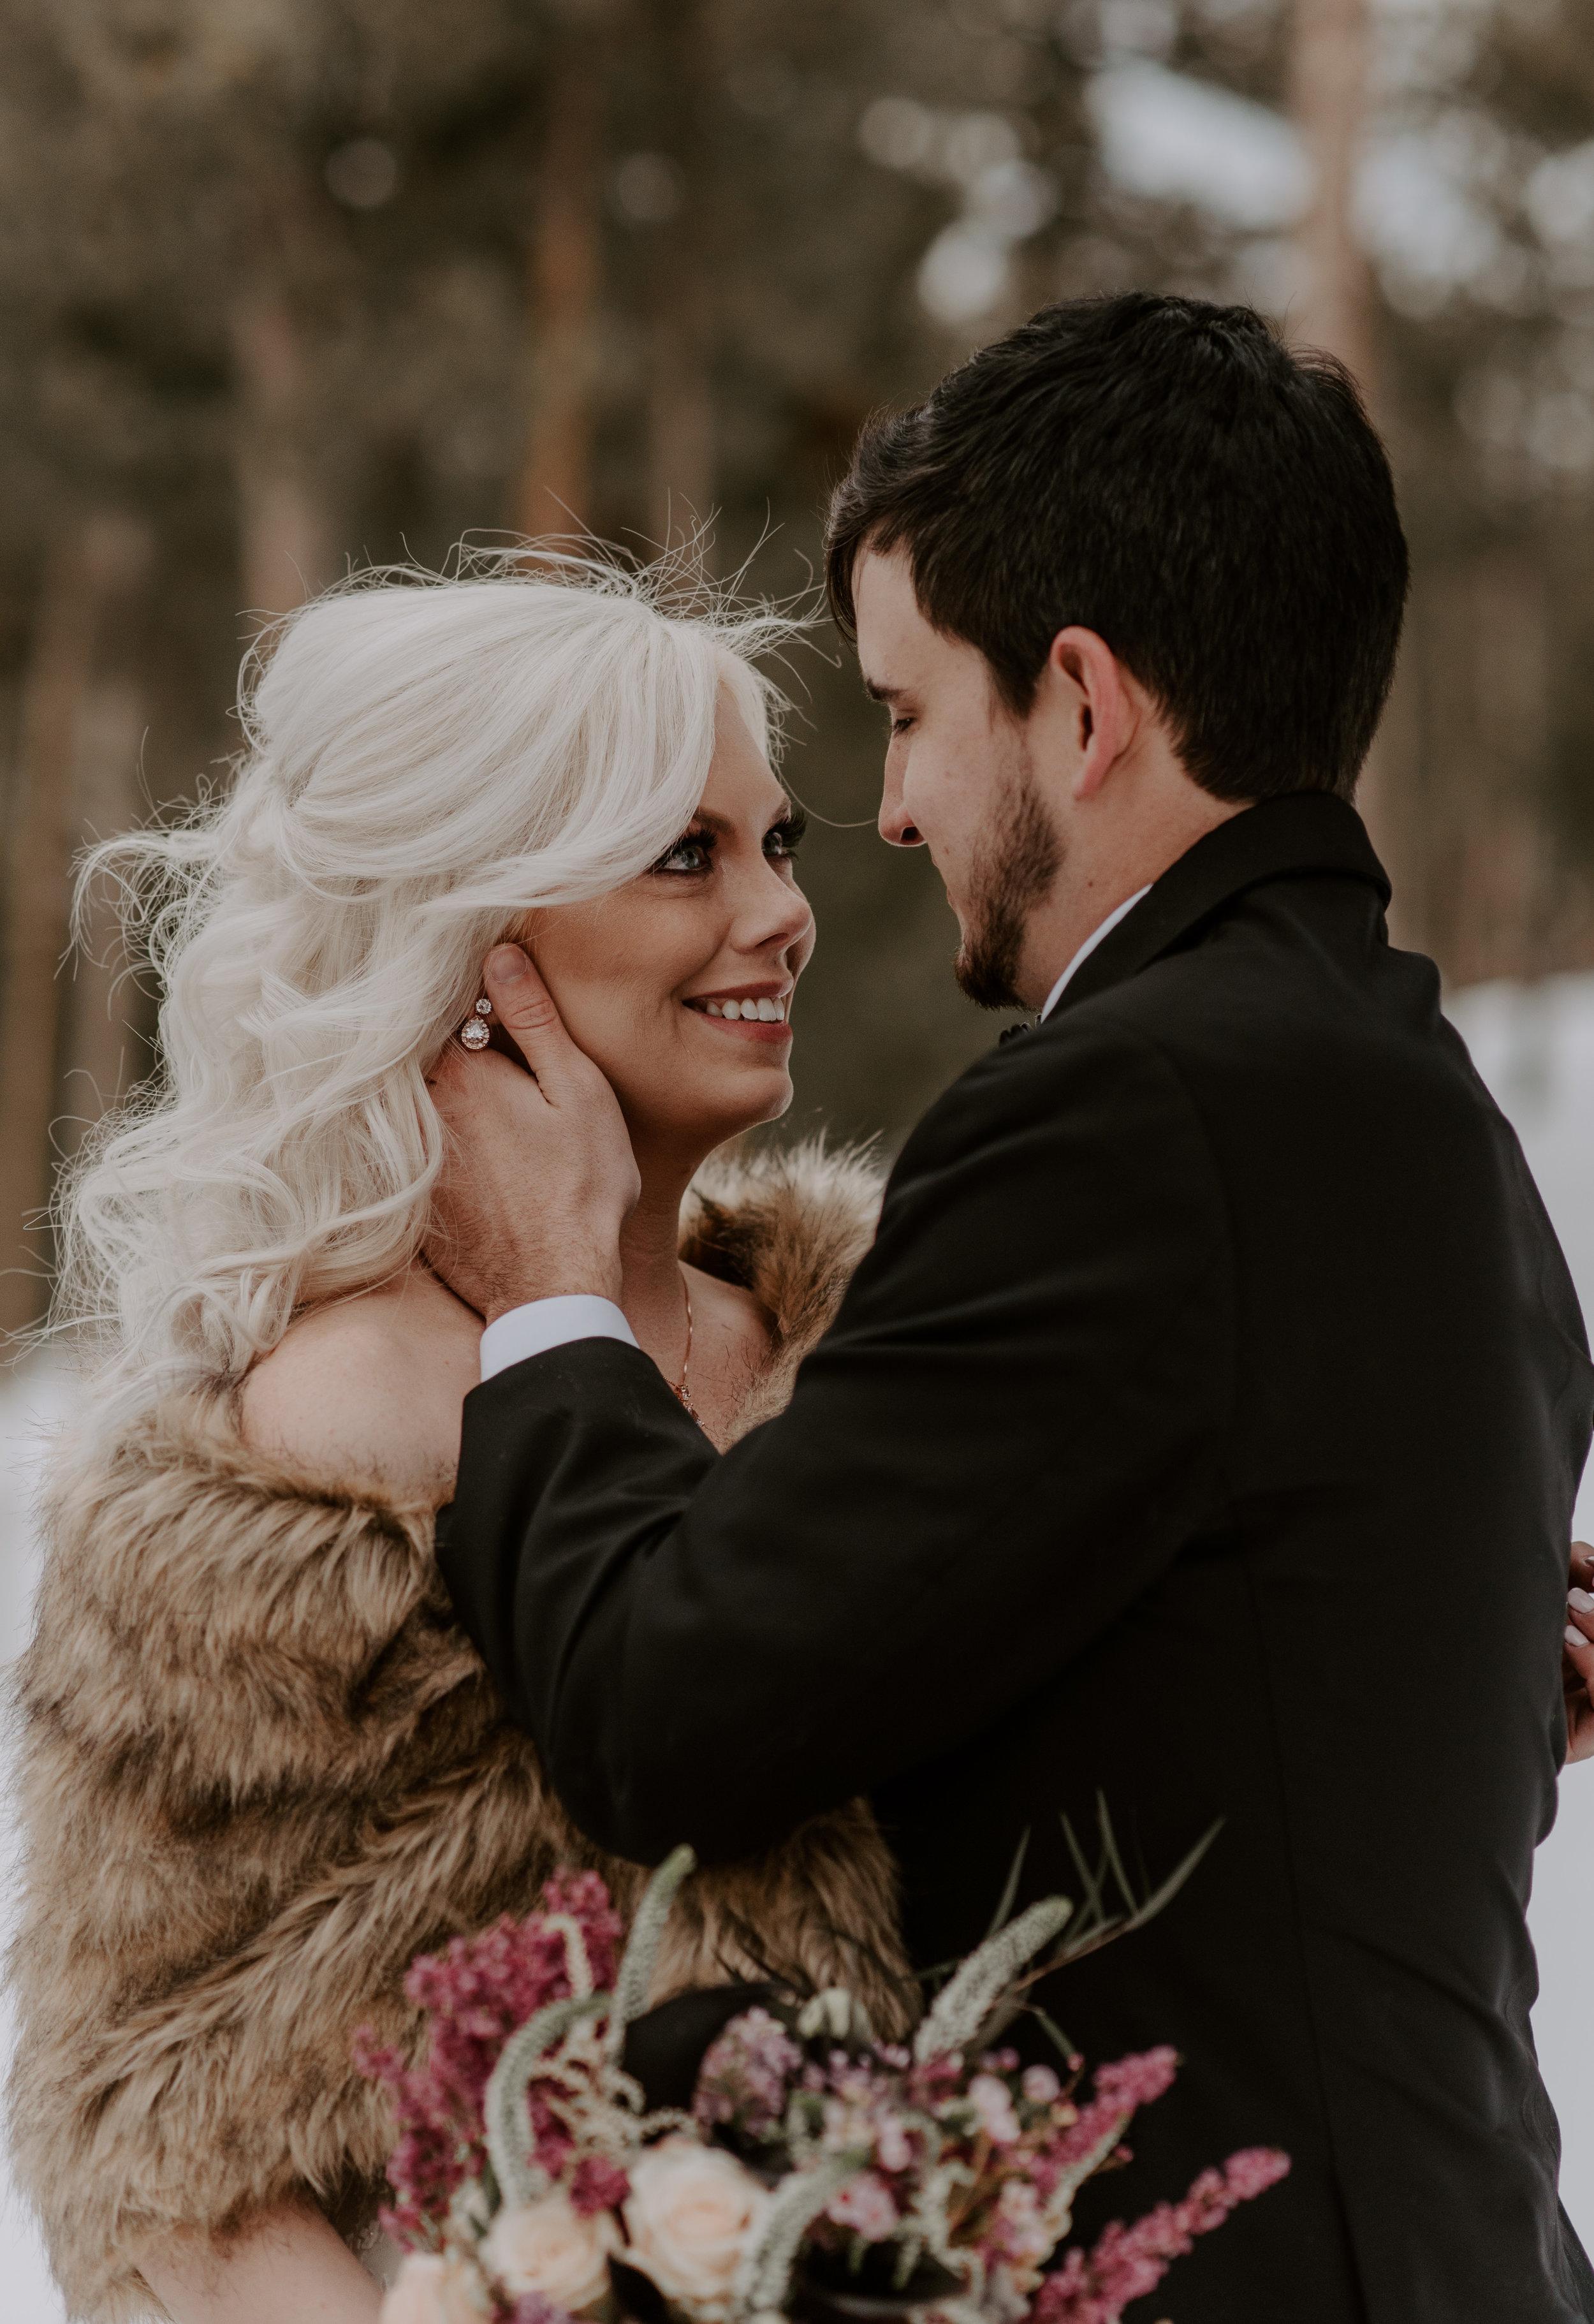 Colorado mountain elopement photographer based in Denver. Adventure wedding photographer.